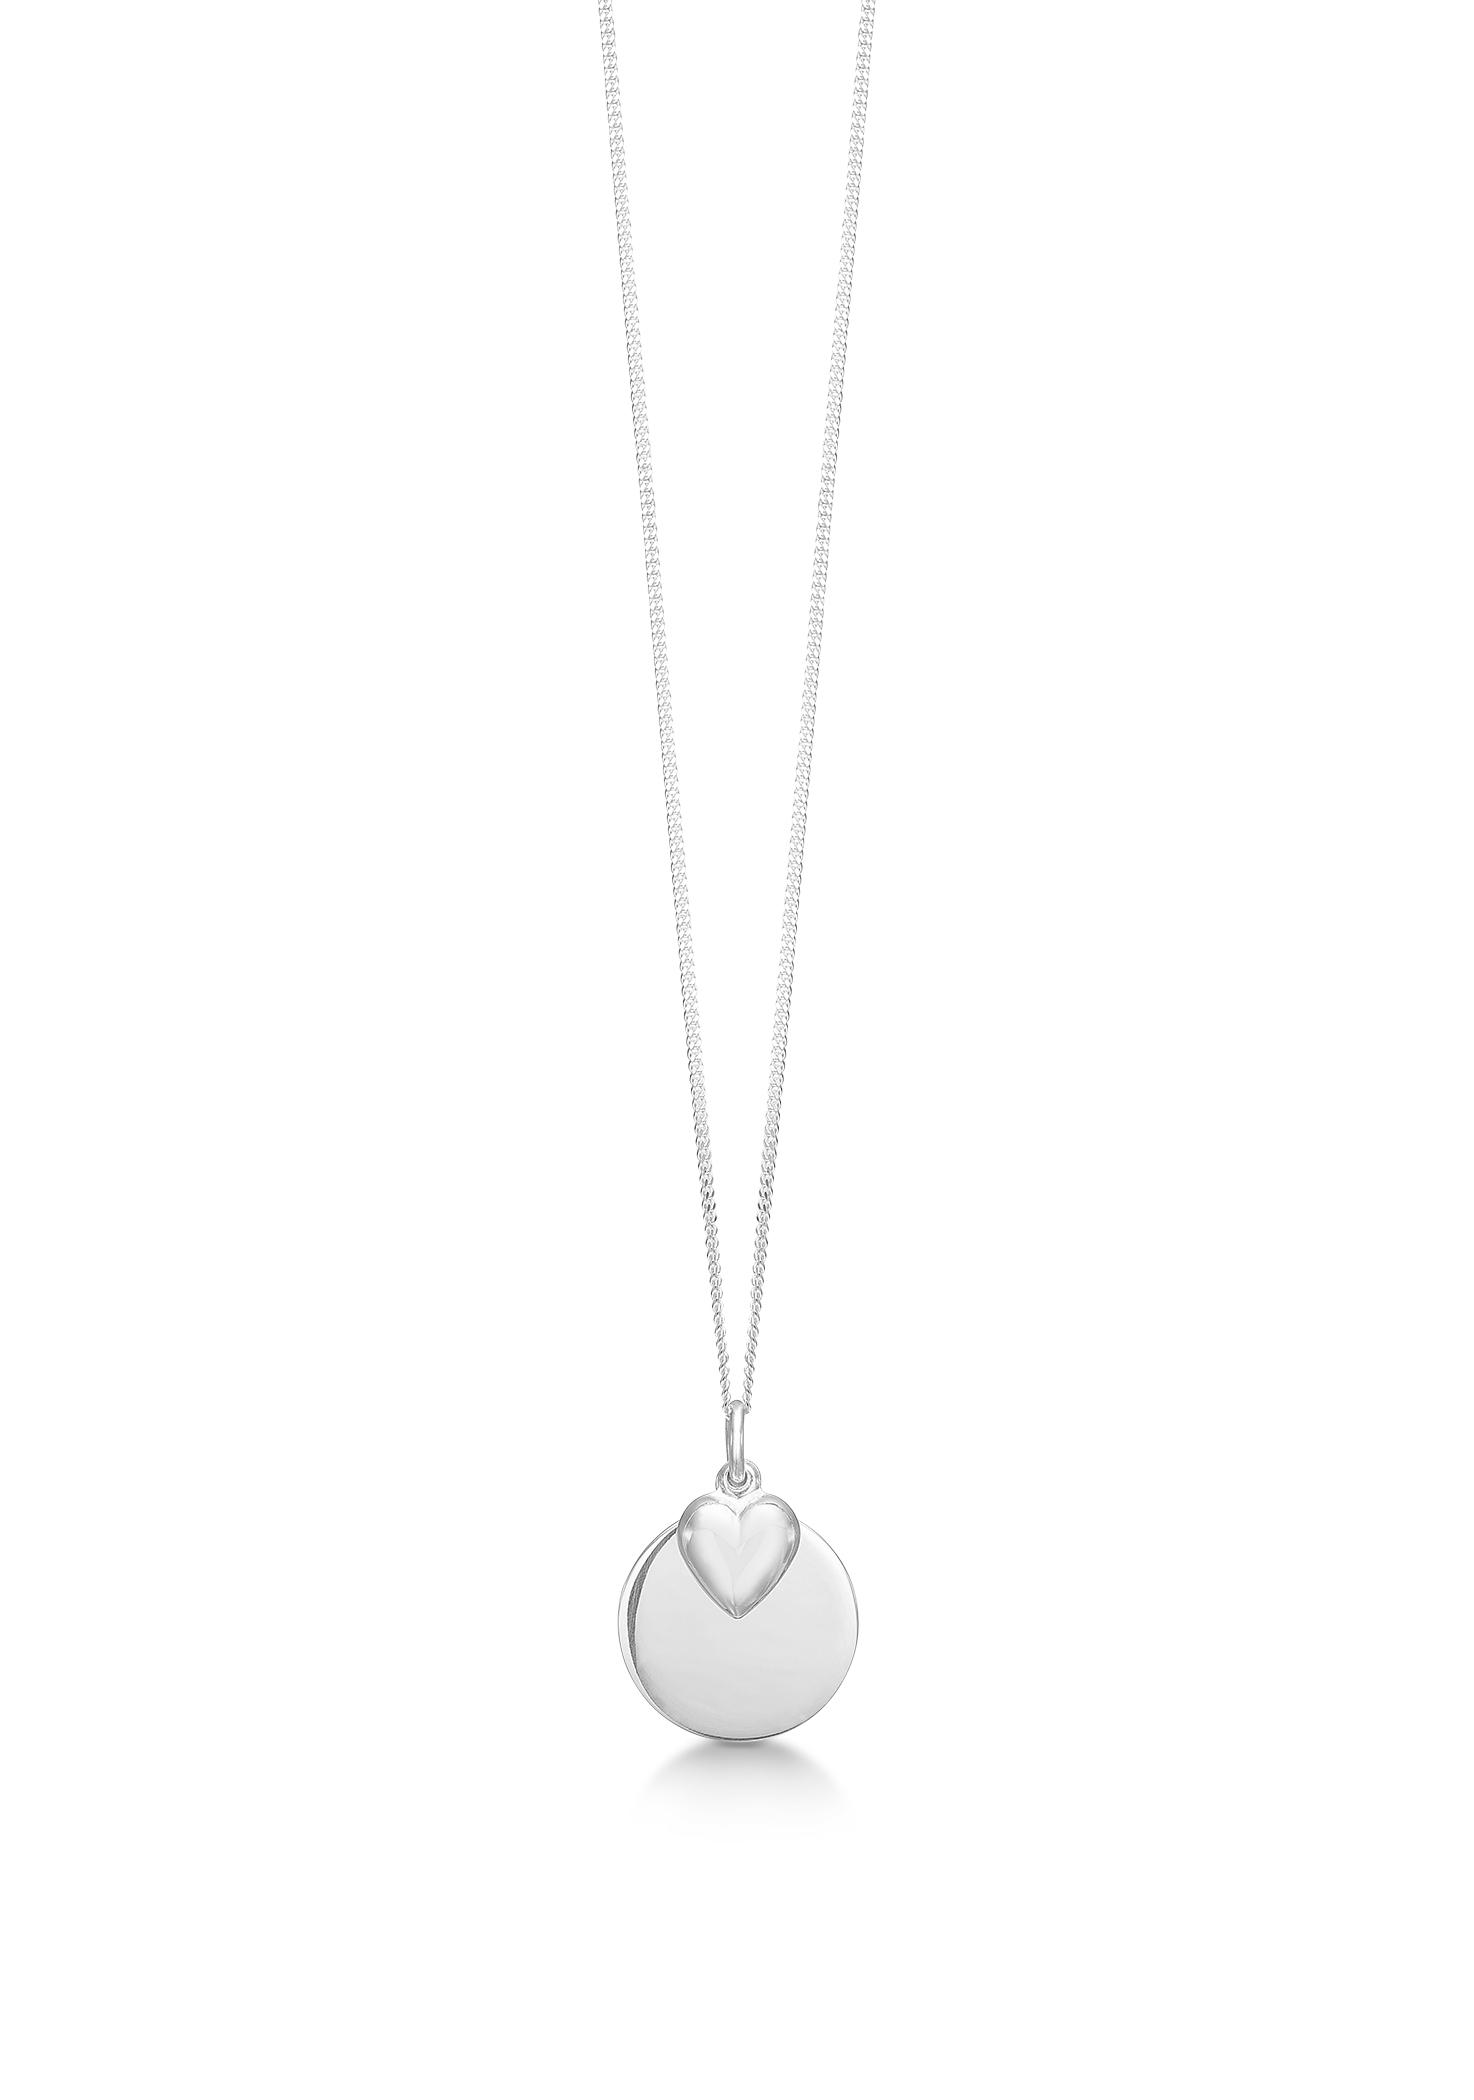 Aagaard sølv collier med blank plade & hjerte - 11302946-40